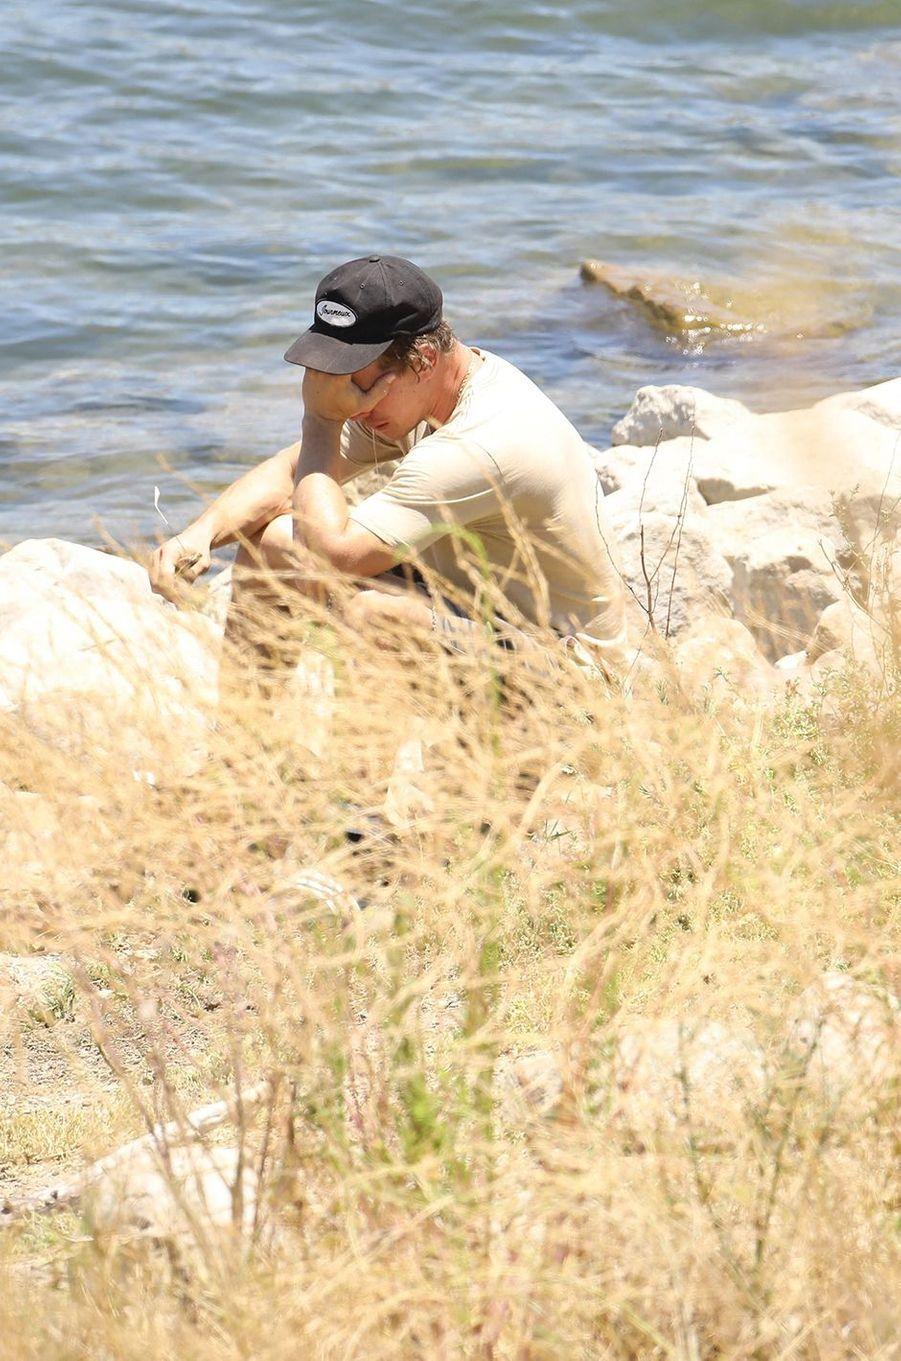 Ryan Dorsey au lac Piru le 11 juillet 2020